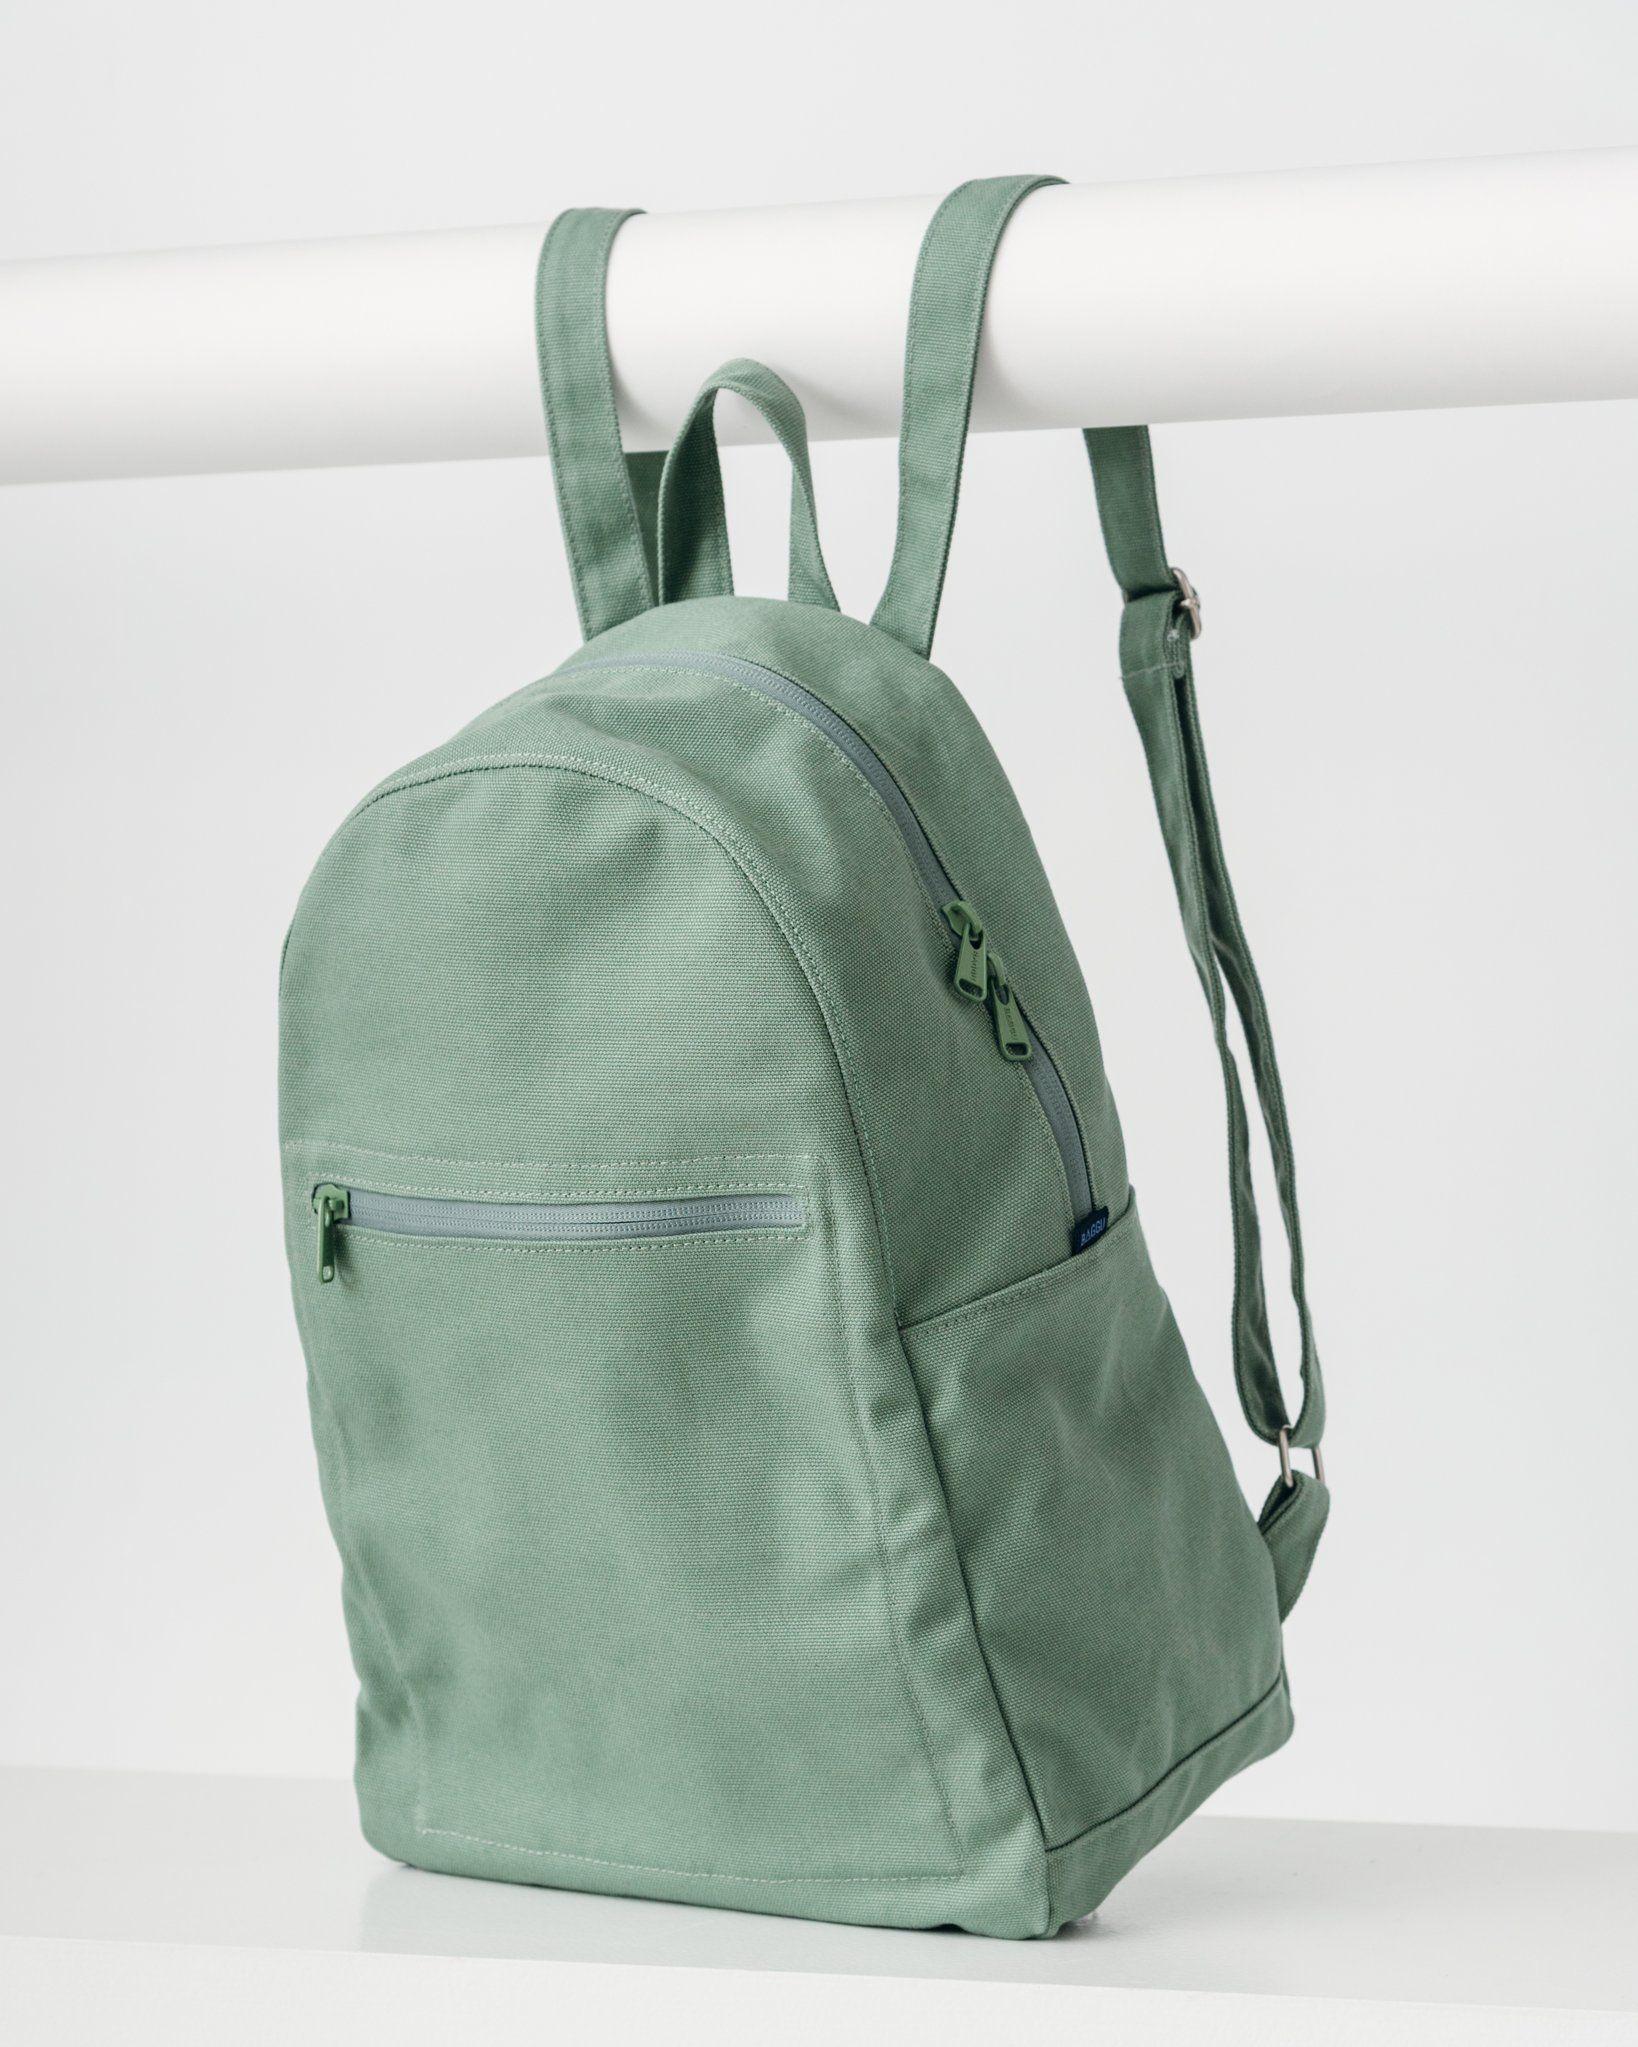 Zip Backpack - Olive – BAGGU Wholesale  a21b5d68538c2